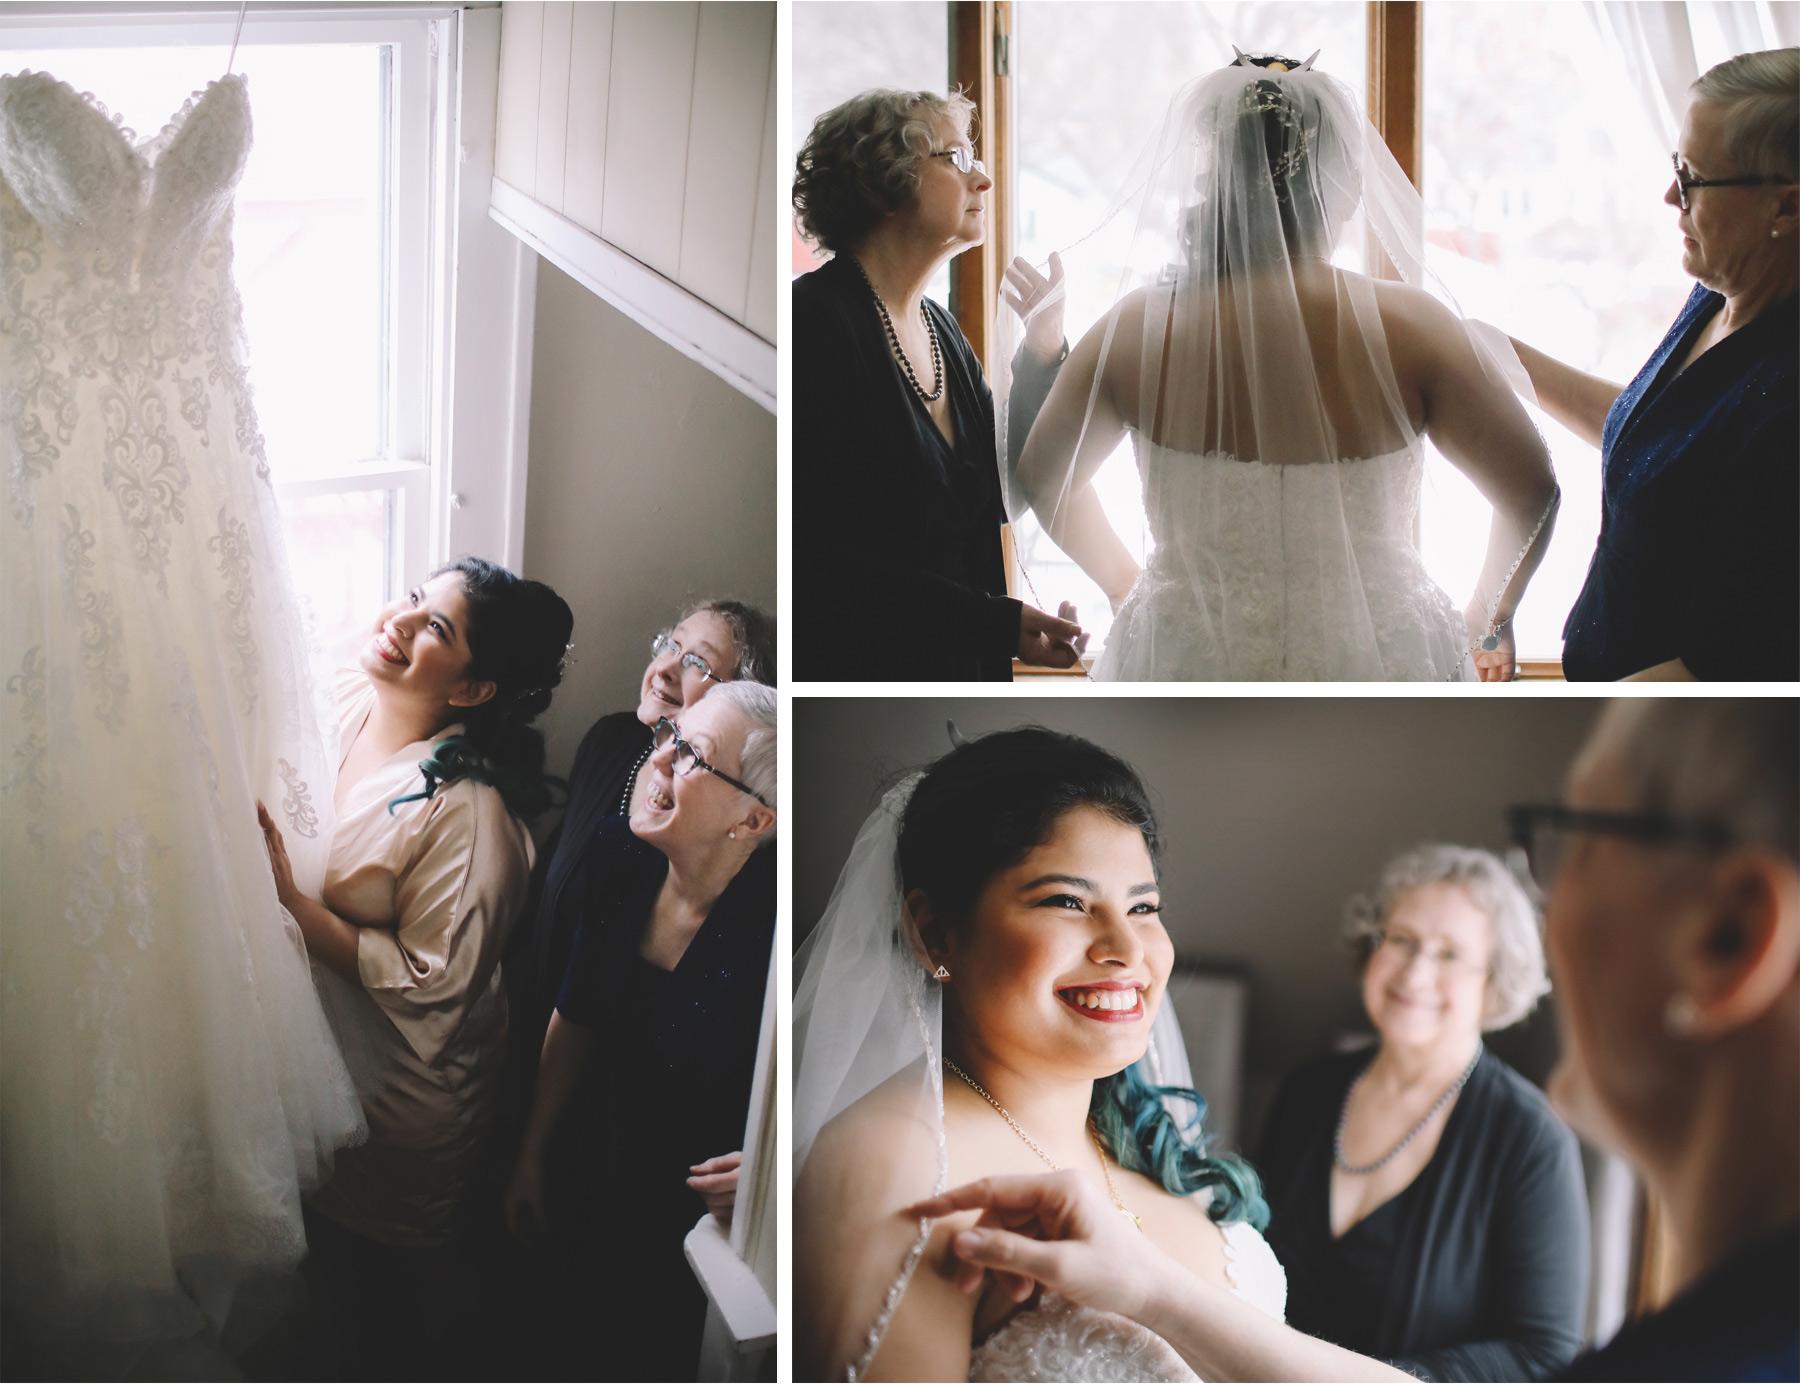 02-Saint-Paul-Minnesota-Wedding-Photography-by-Vick-Photography-Dress-Bride-Mother-Getting-Ready-Hotel-Elena-and-Doug.jpg